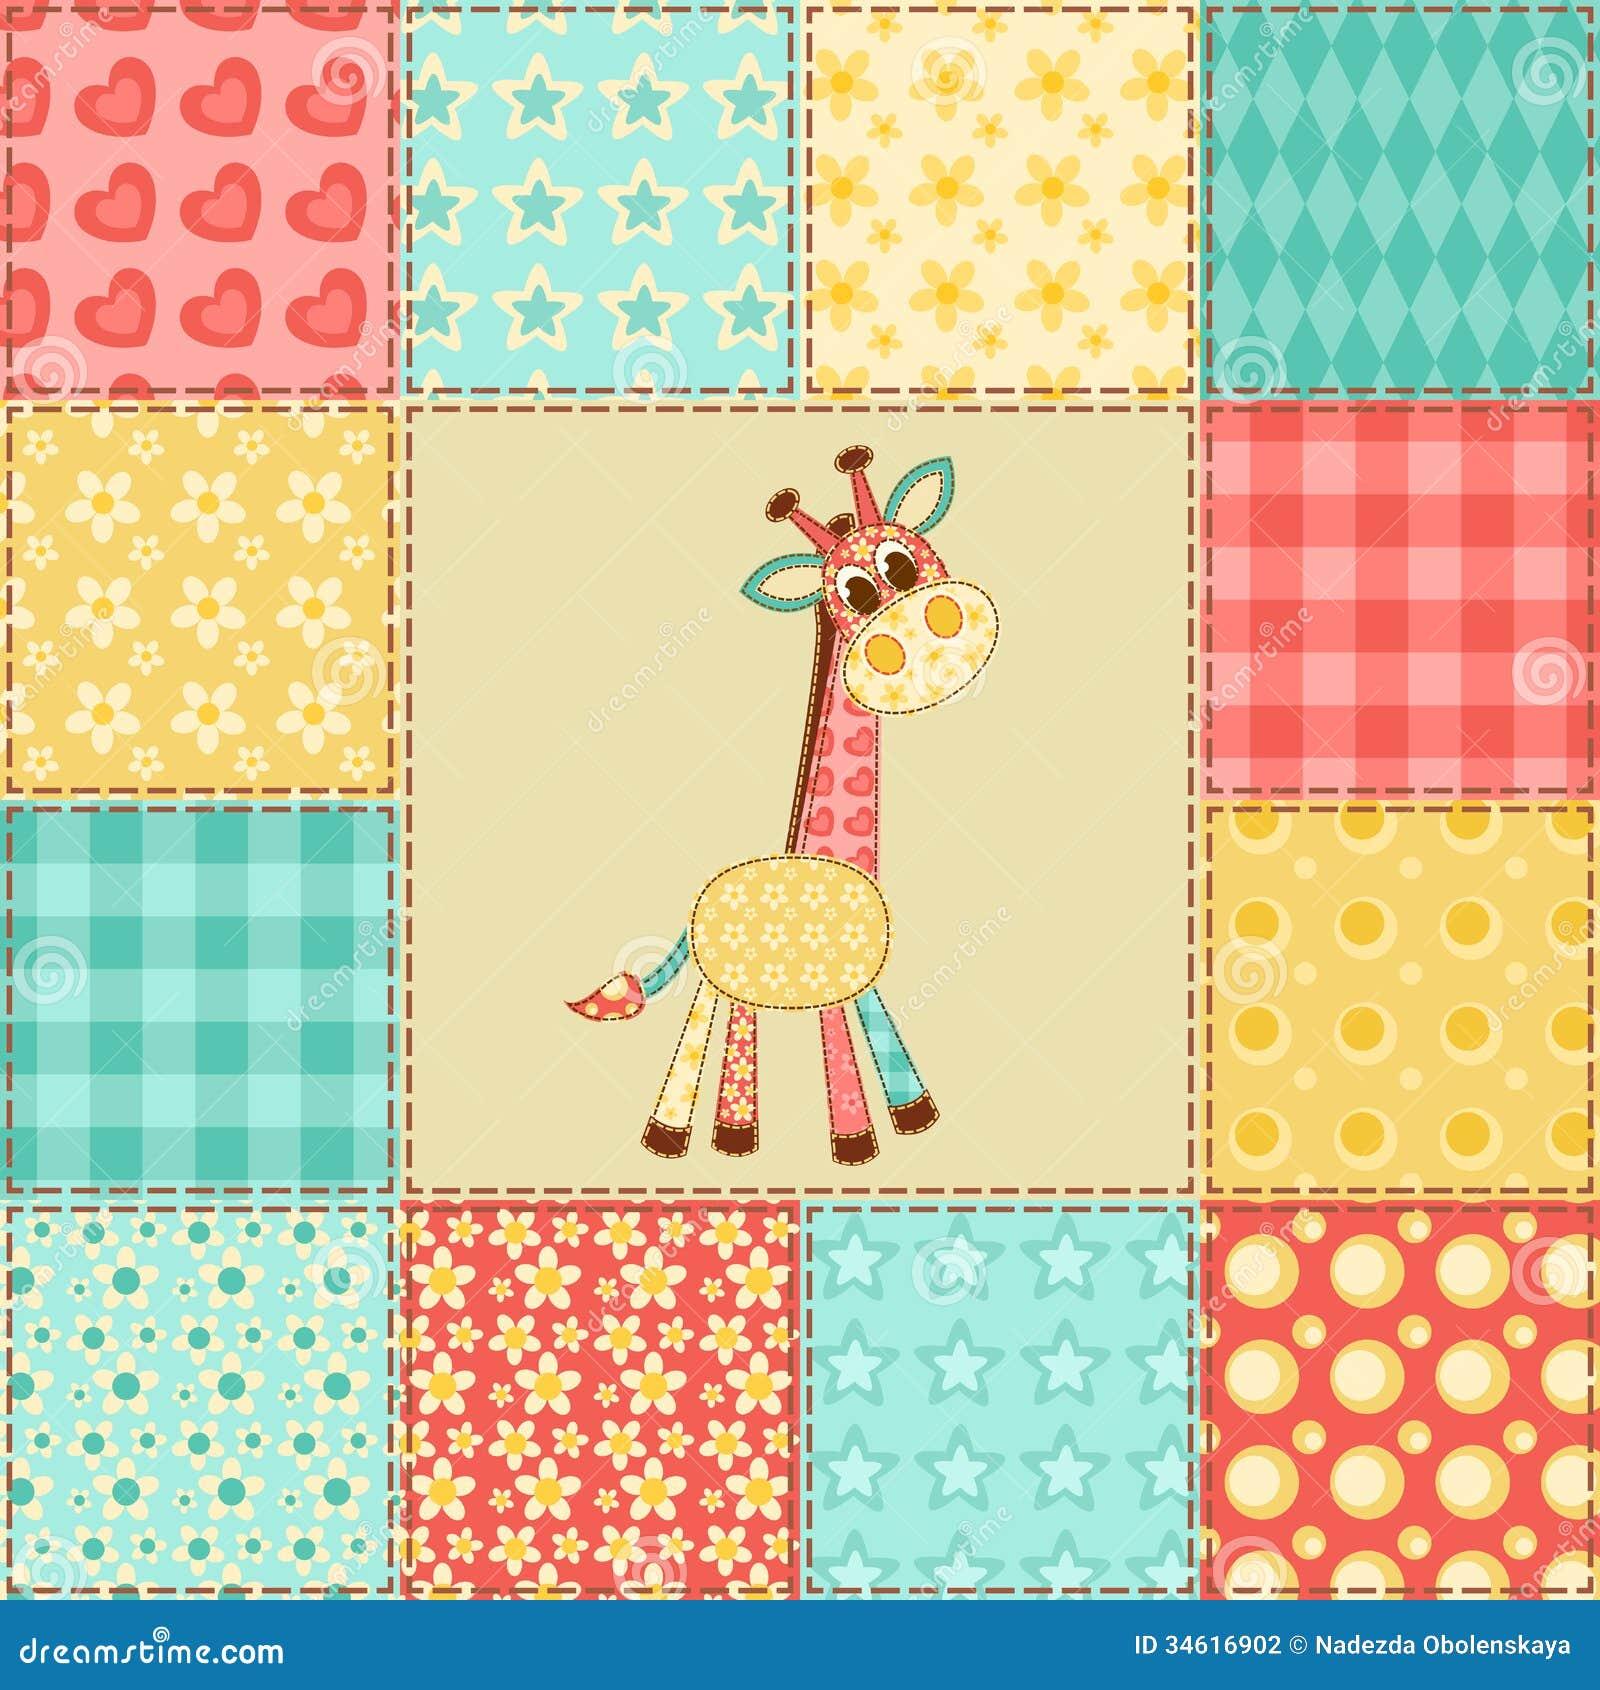 mod le de patchwork de girafe photographie stock image 34616902. Black Bedroom Furniture Sets. Home Design Ideas